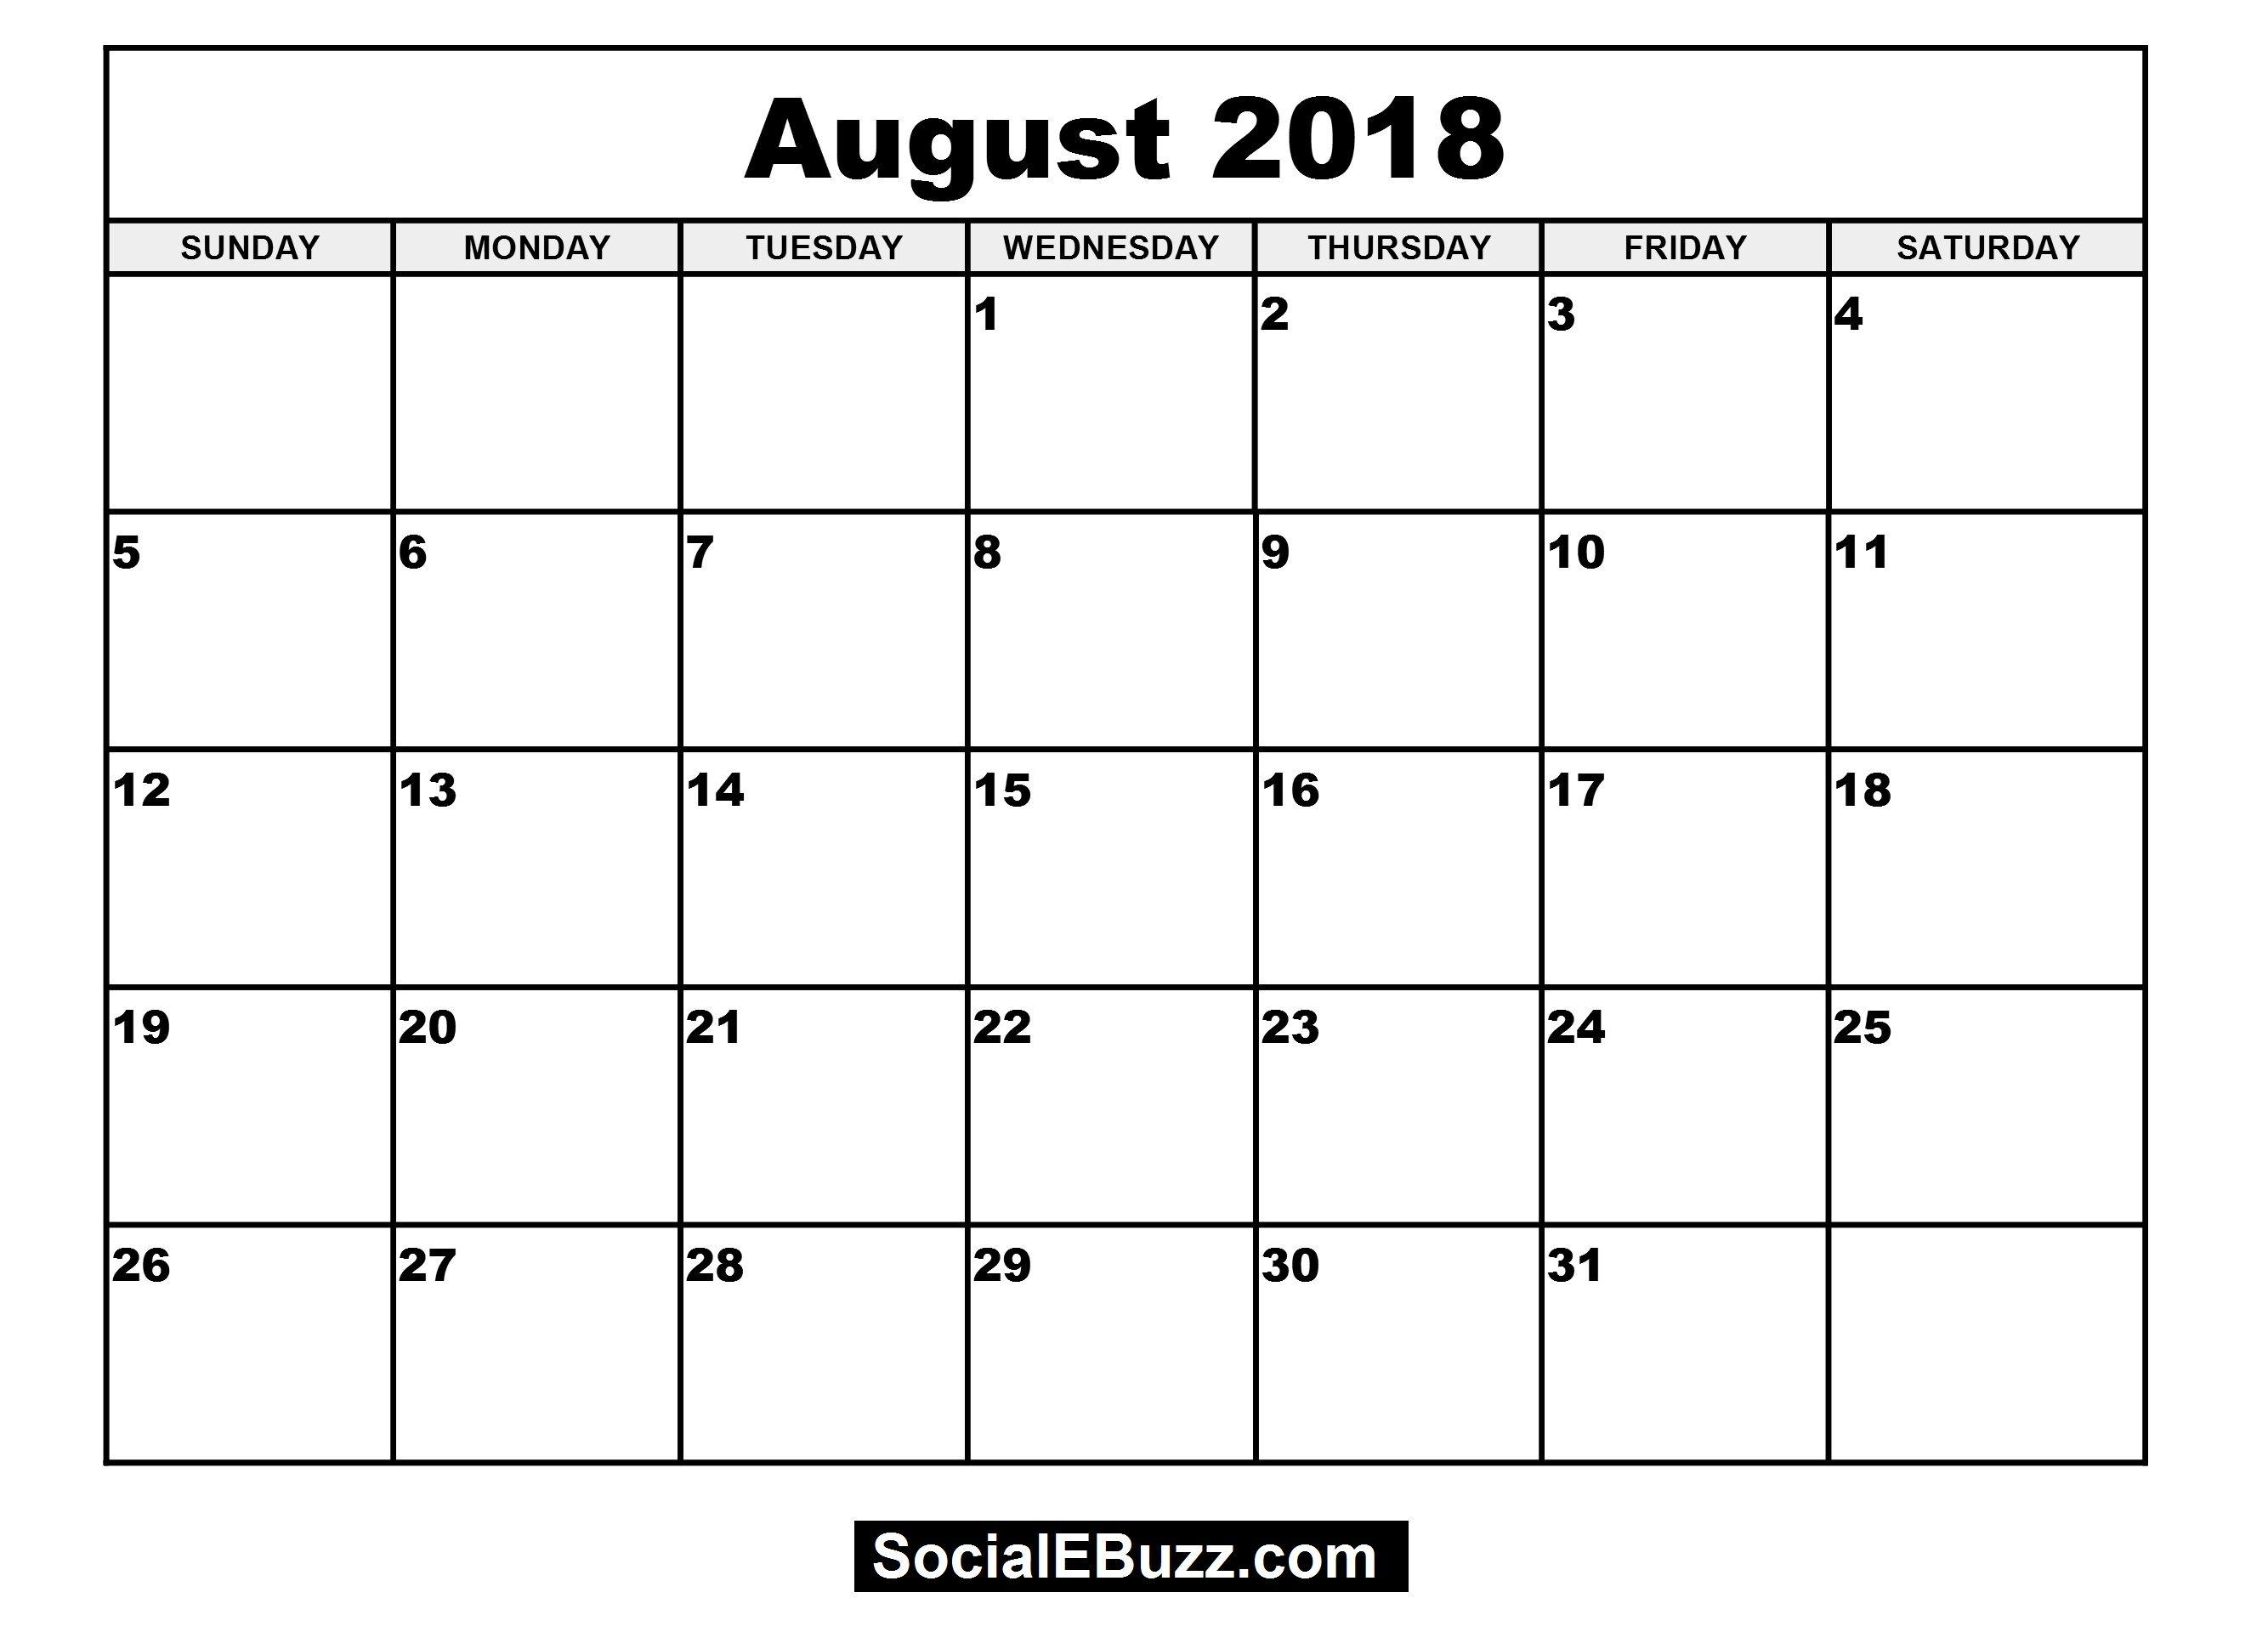 Pincalendar Printable On August 2018 Calendar | 2018 Calendar throughout Printable Calendar Templates August Through December